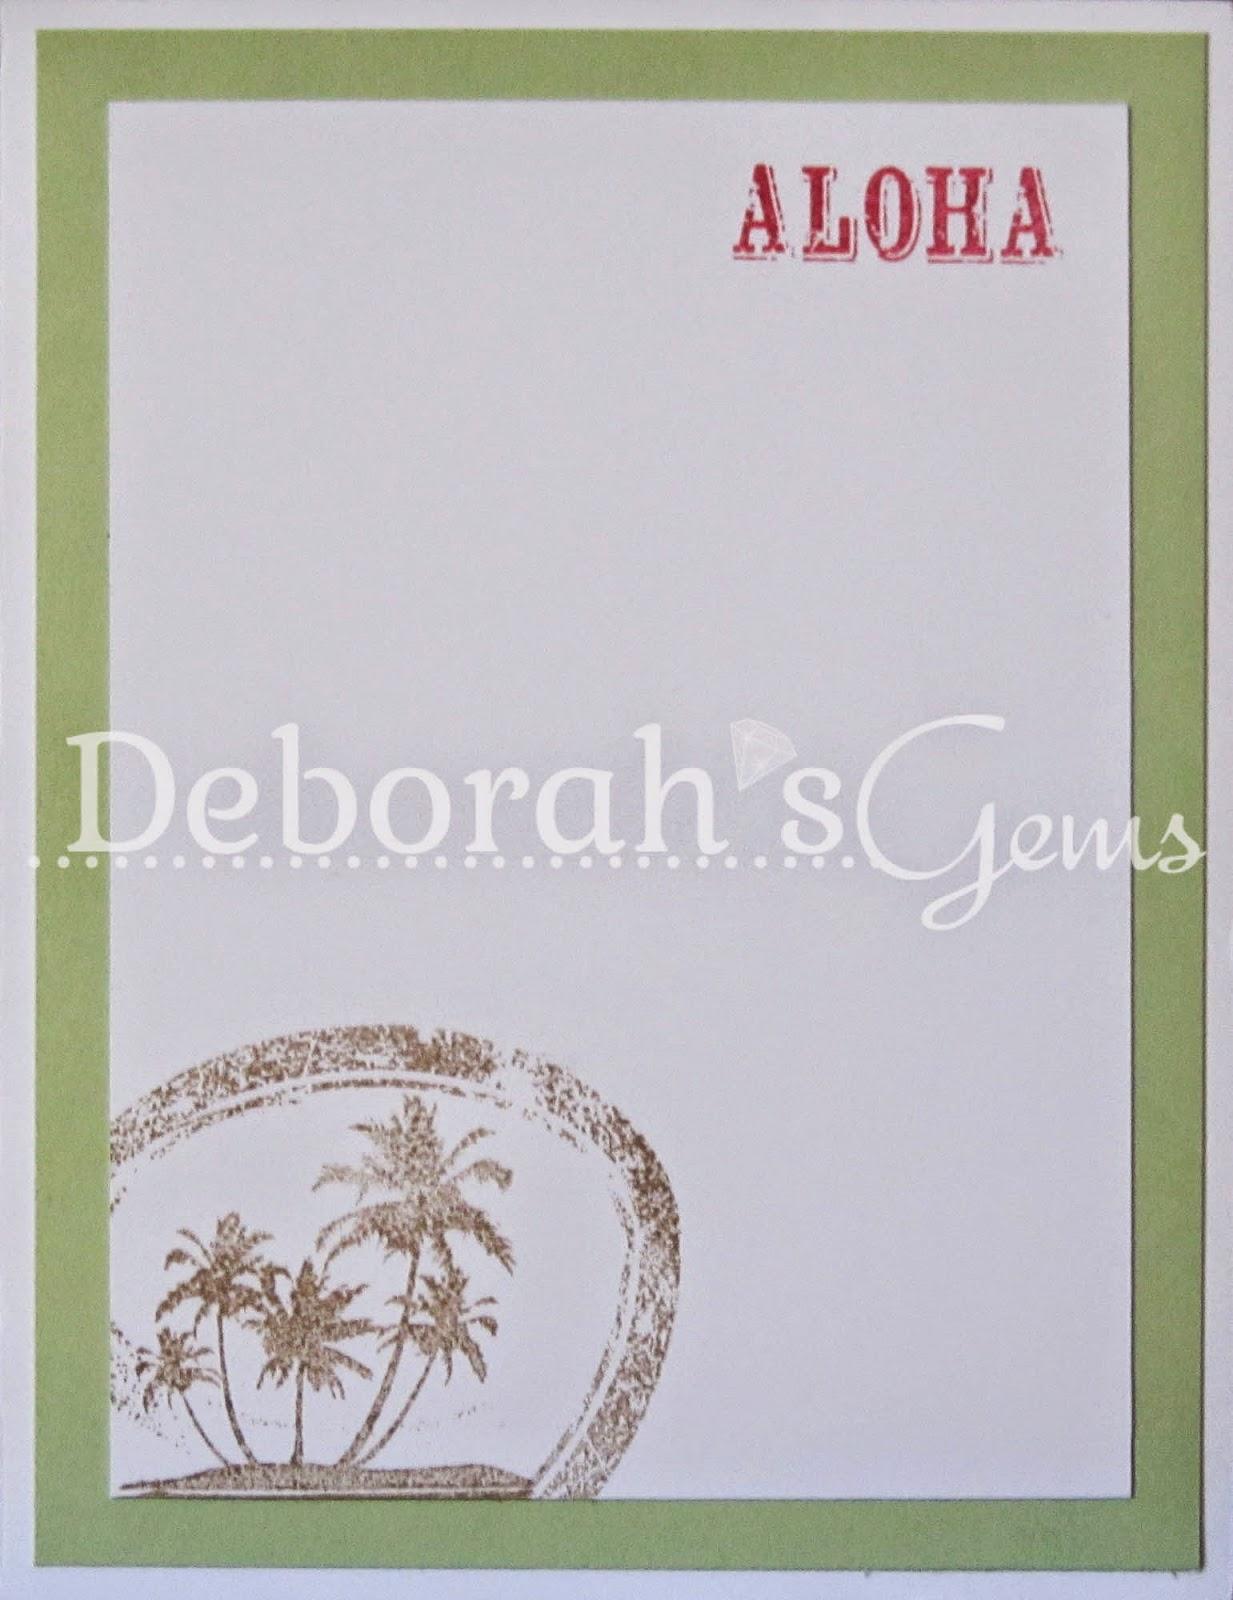 Aloha inside - photo by Deborah Frings - Deborah's Gems